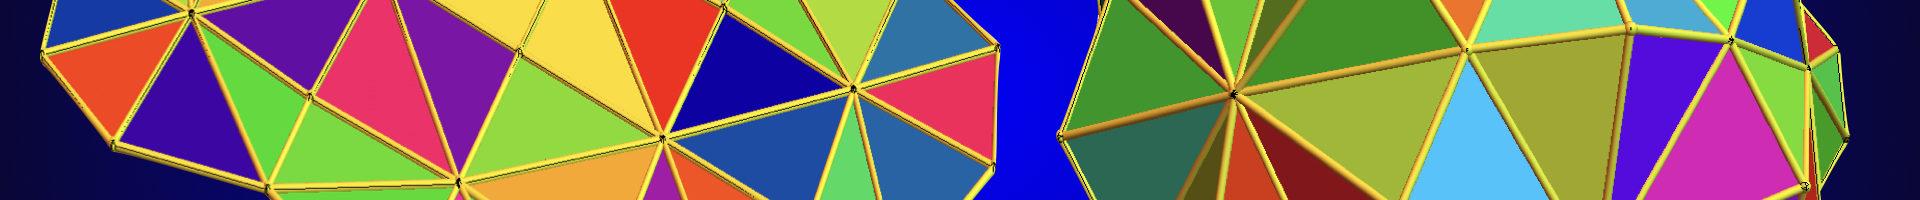 The Hamiltonian Manifold Theorem